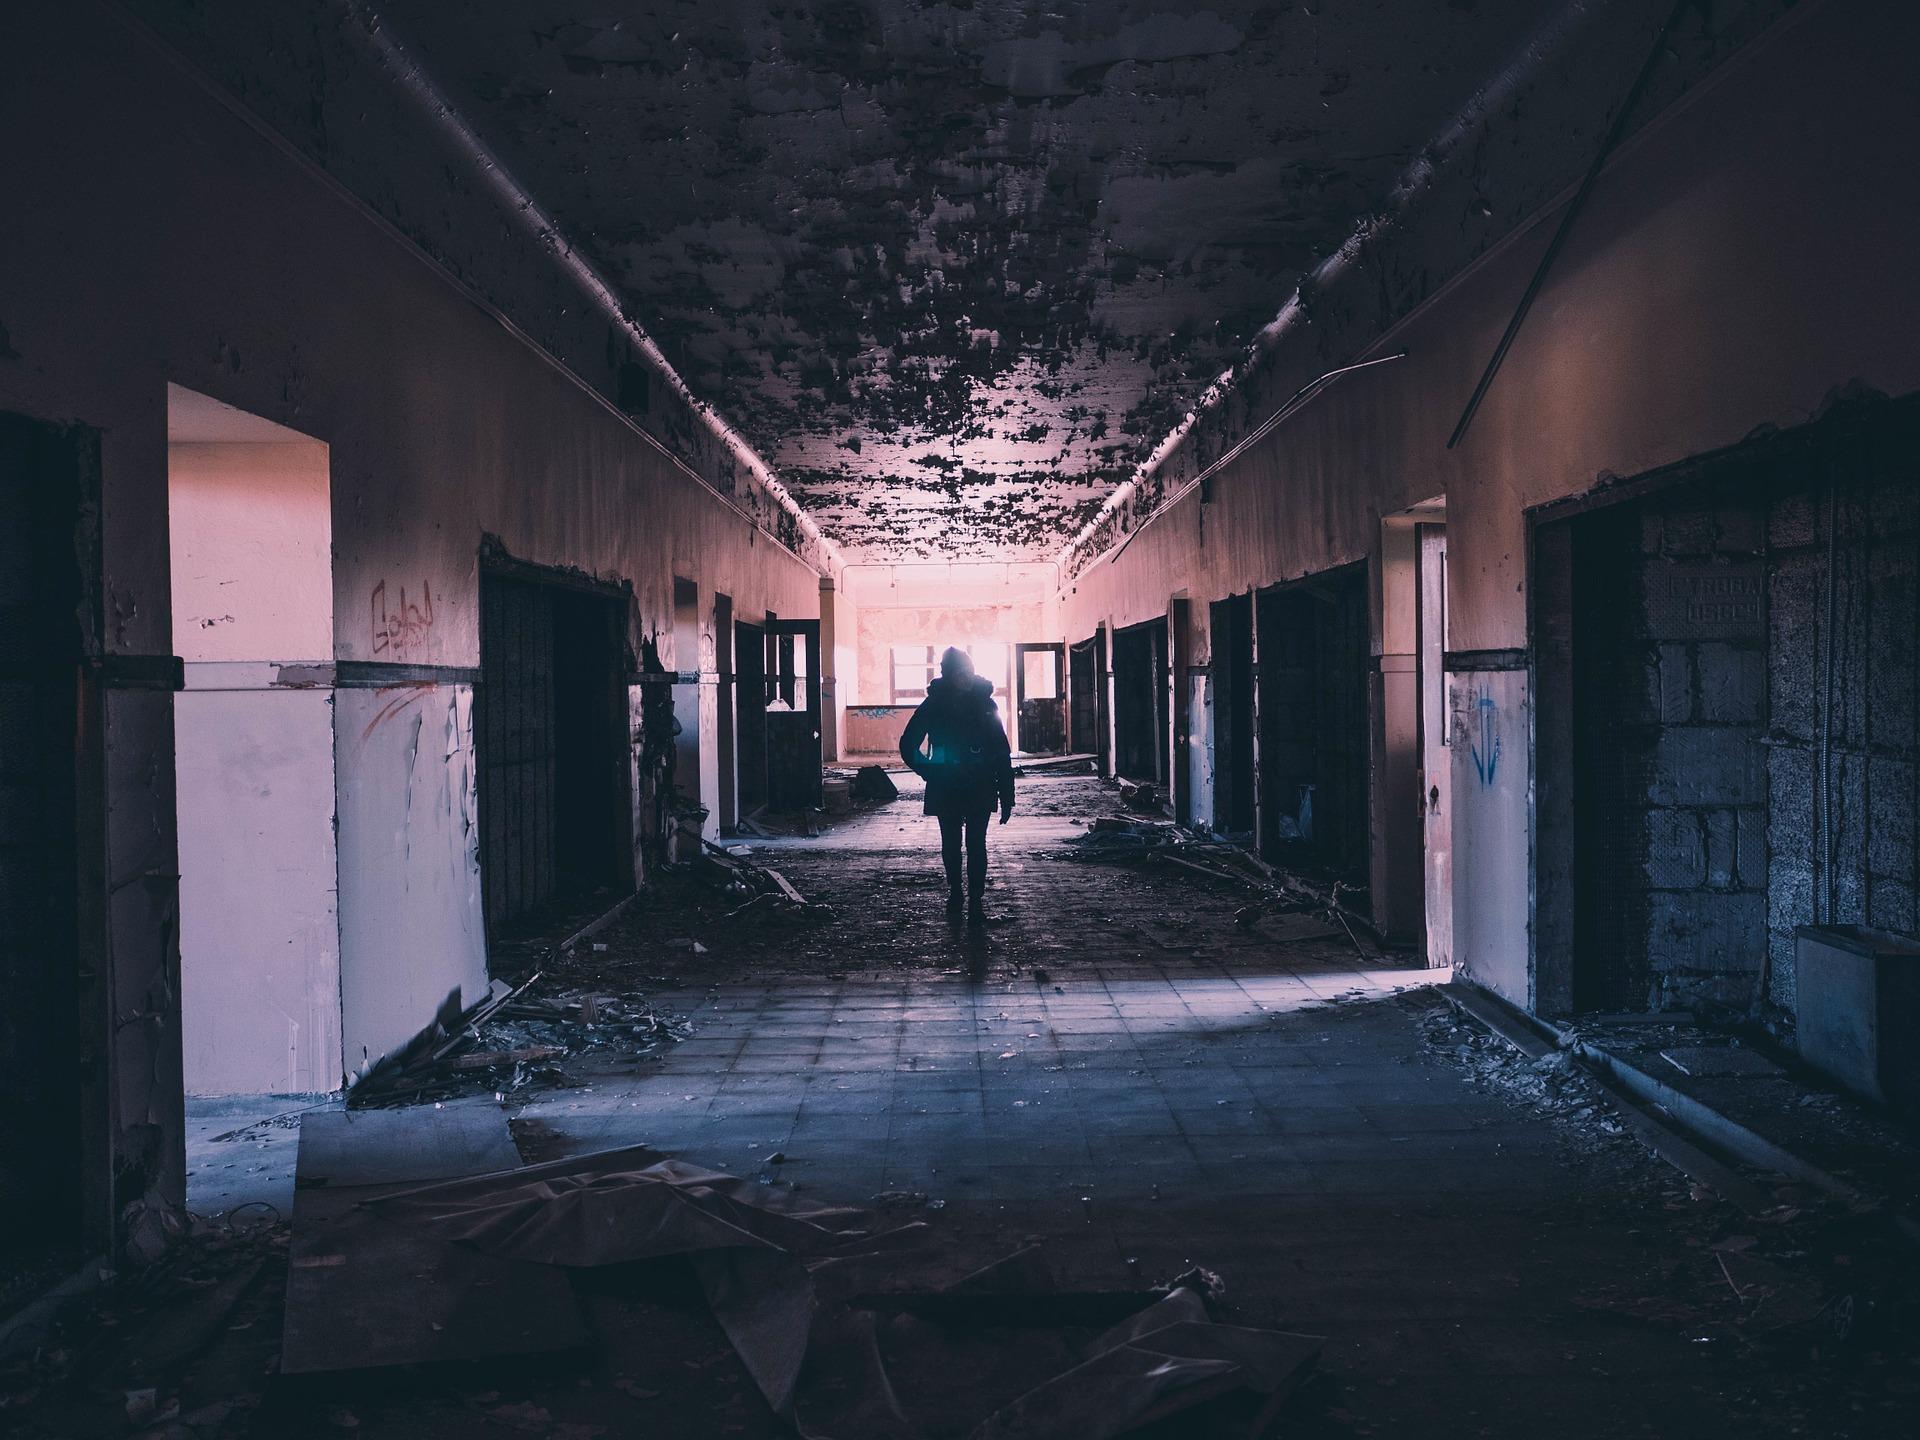 hallway-1245845_1920